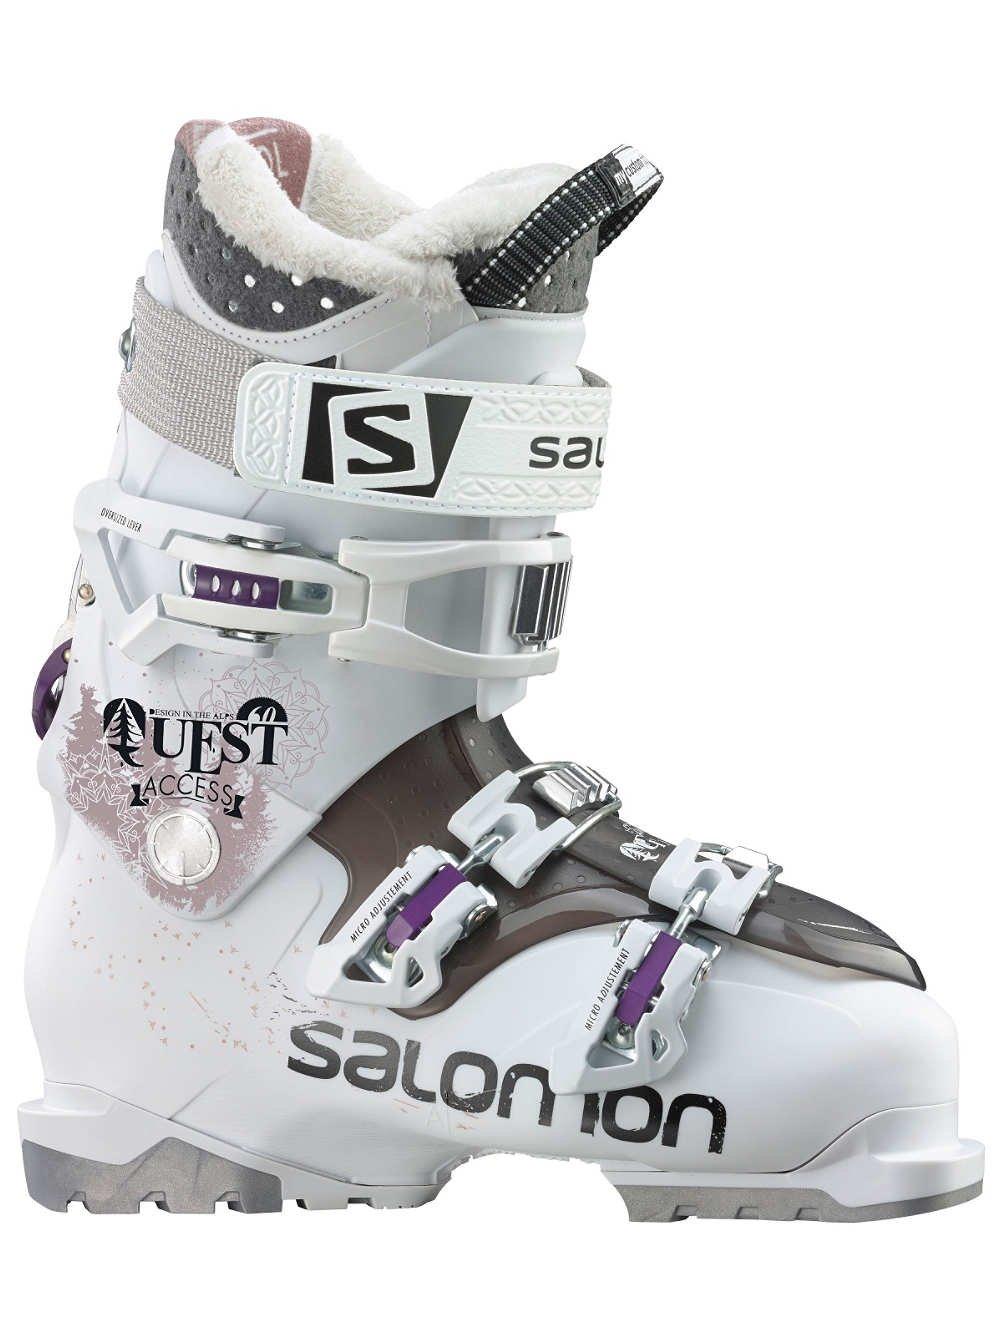 2015 womens ski reviews - 2015 Womens Ski Reviews 52